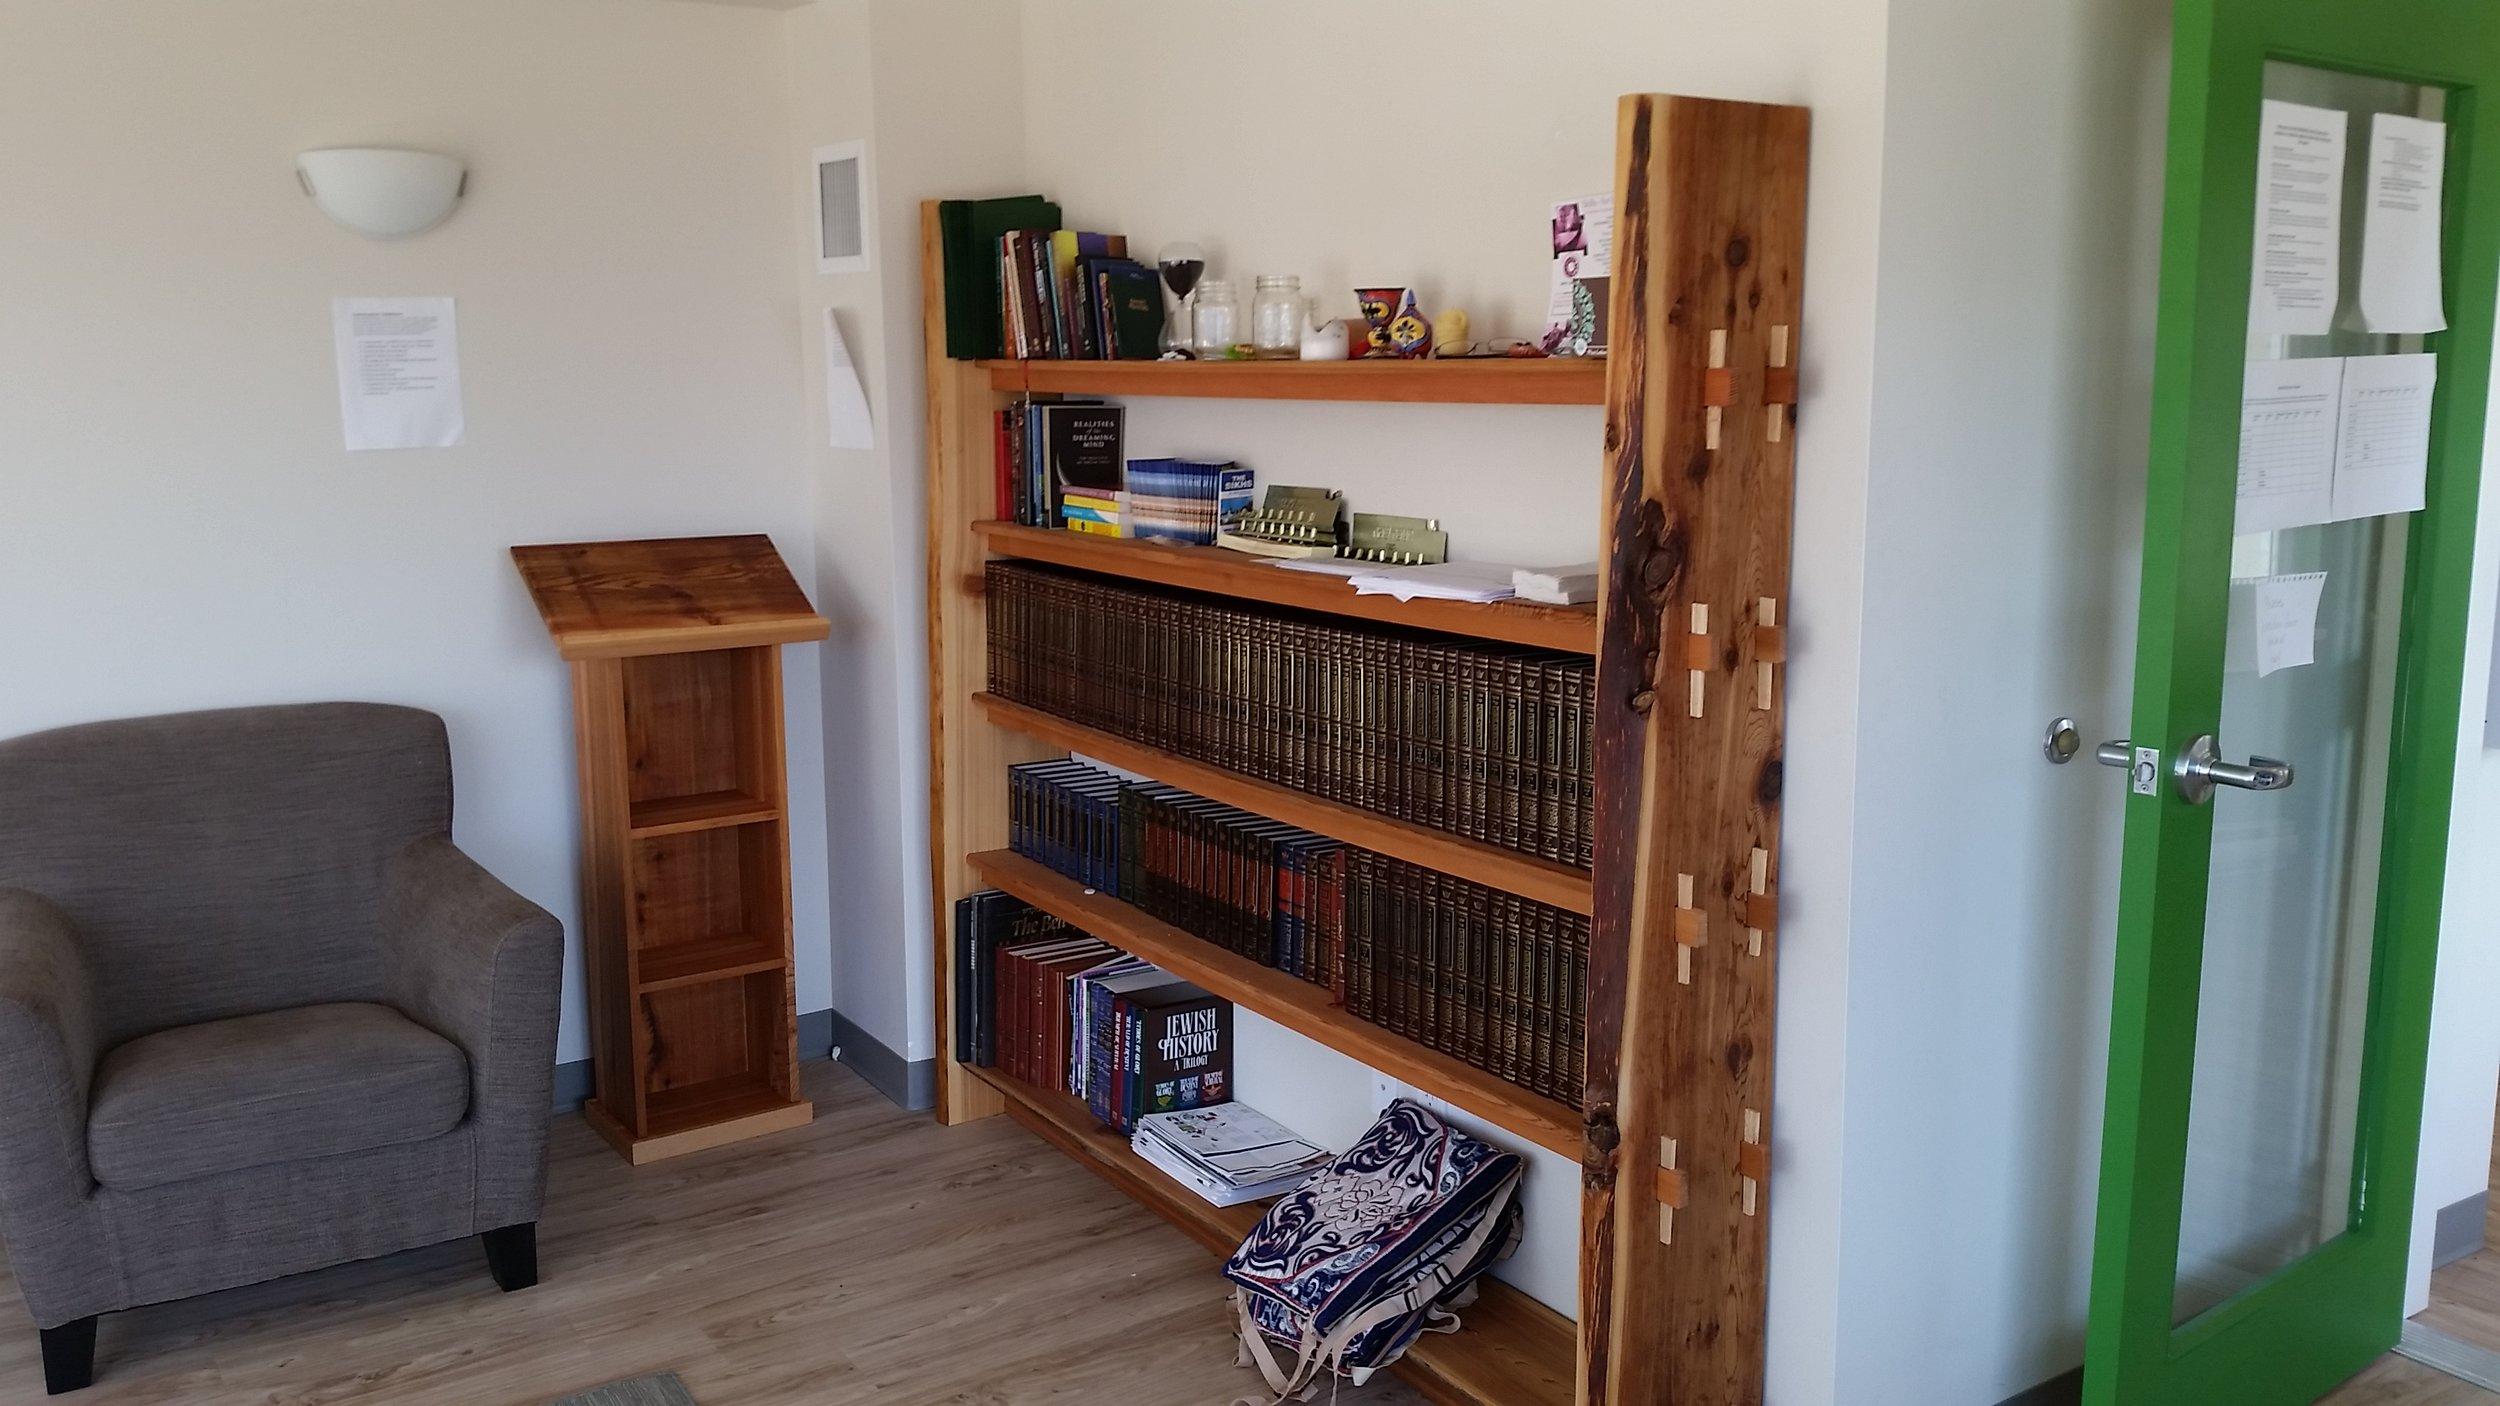 A bookshelf and podium I built for the multi-faith club at Quest University Canada.